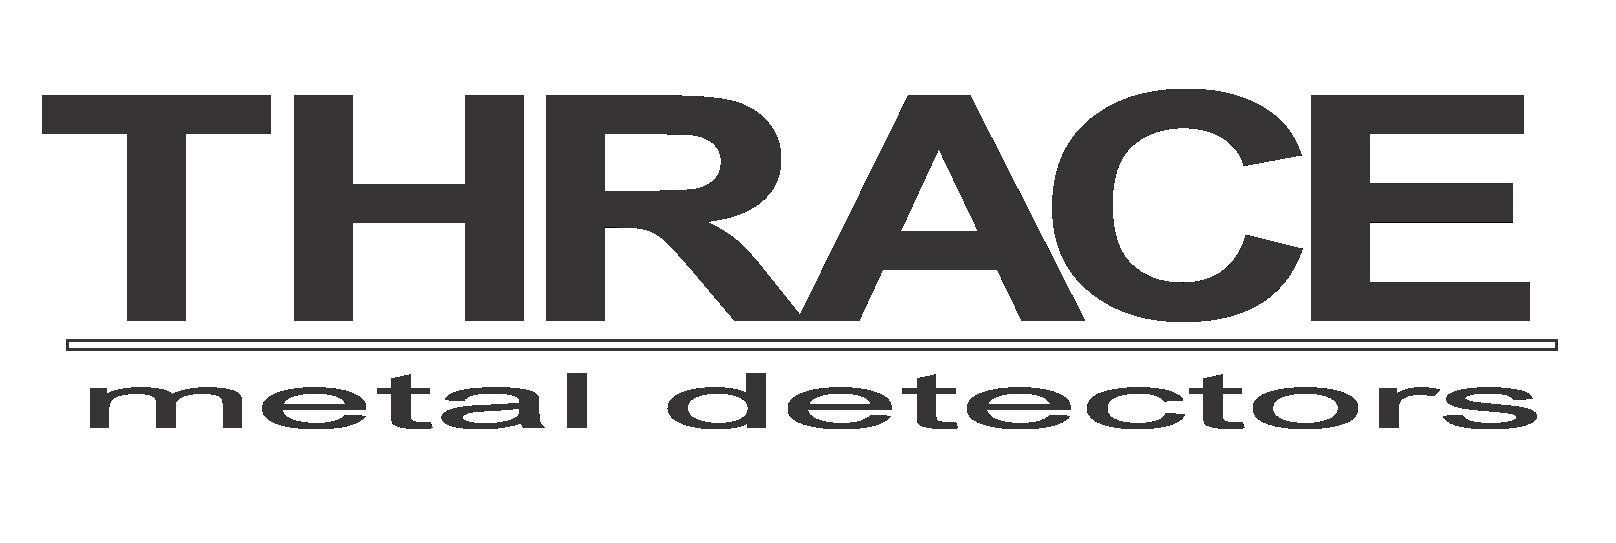 Thrace Metal Detectors